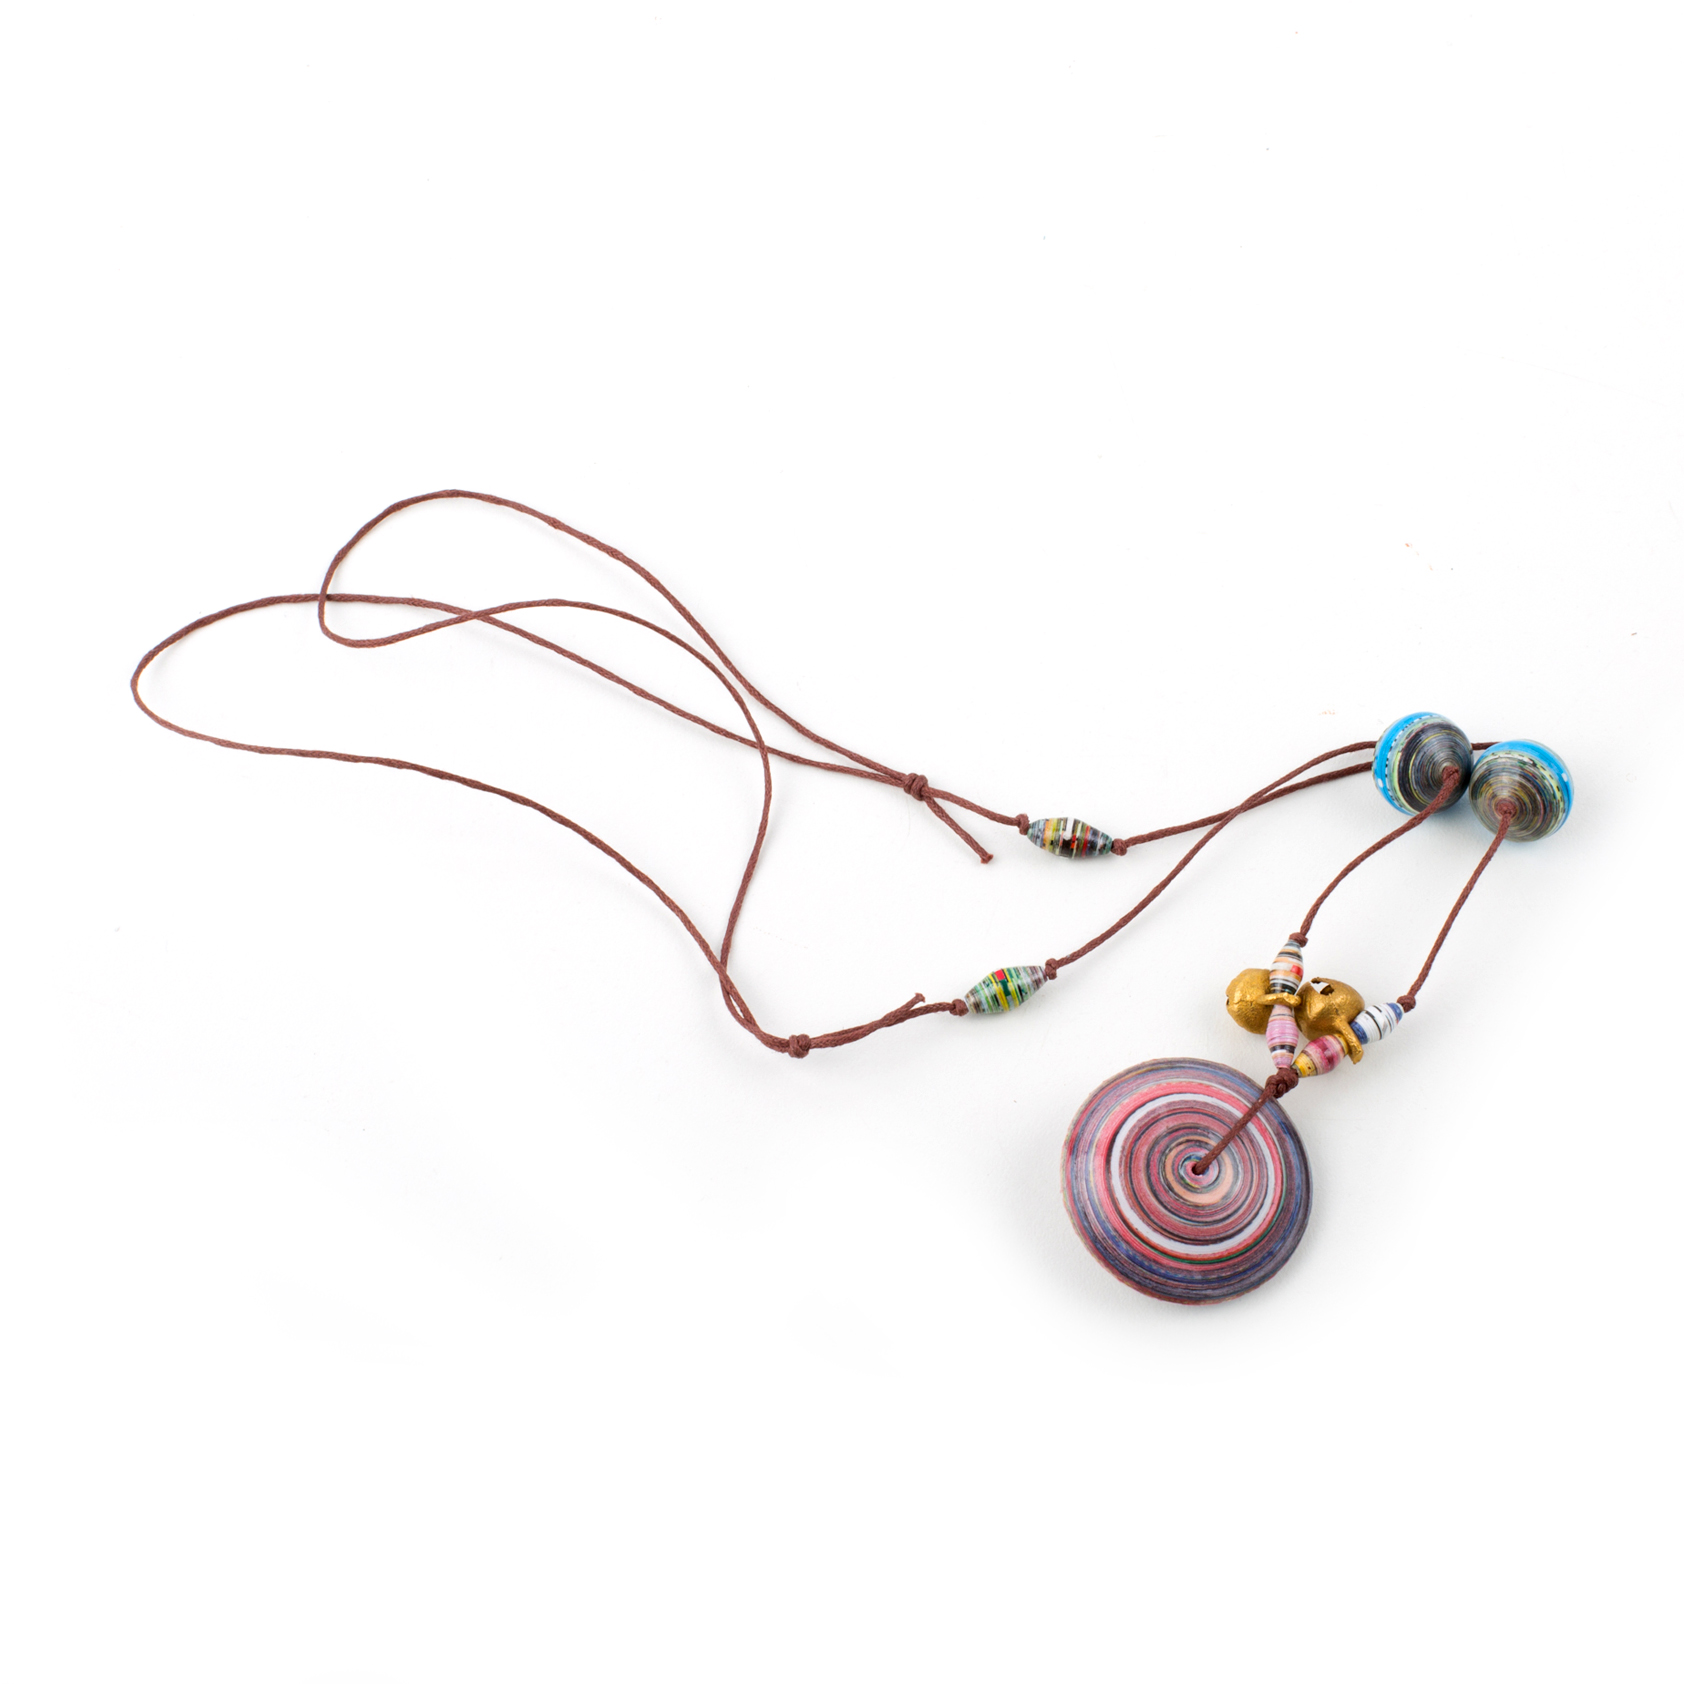 New Jersey >> Handmade Jewelry - Princeton Product PhotographyPrinceton Product Photography